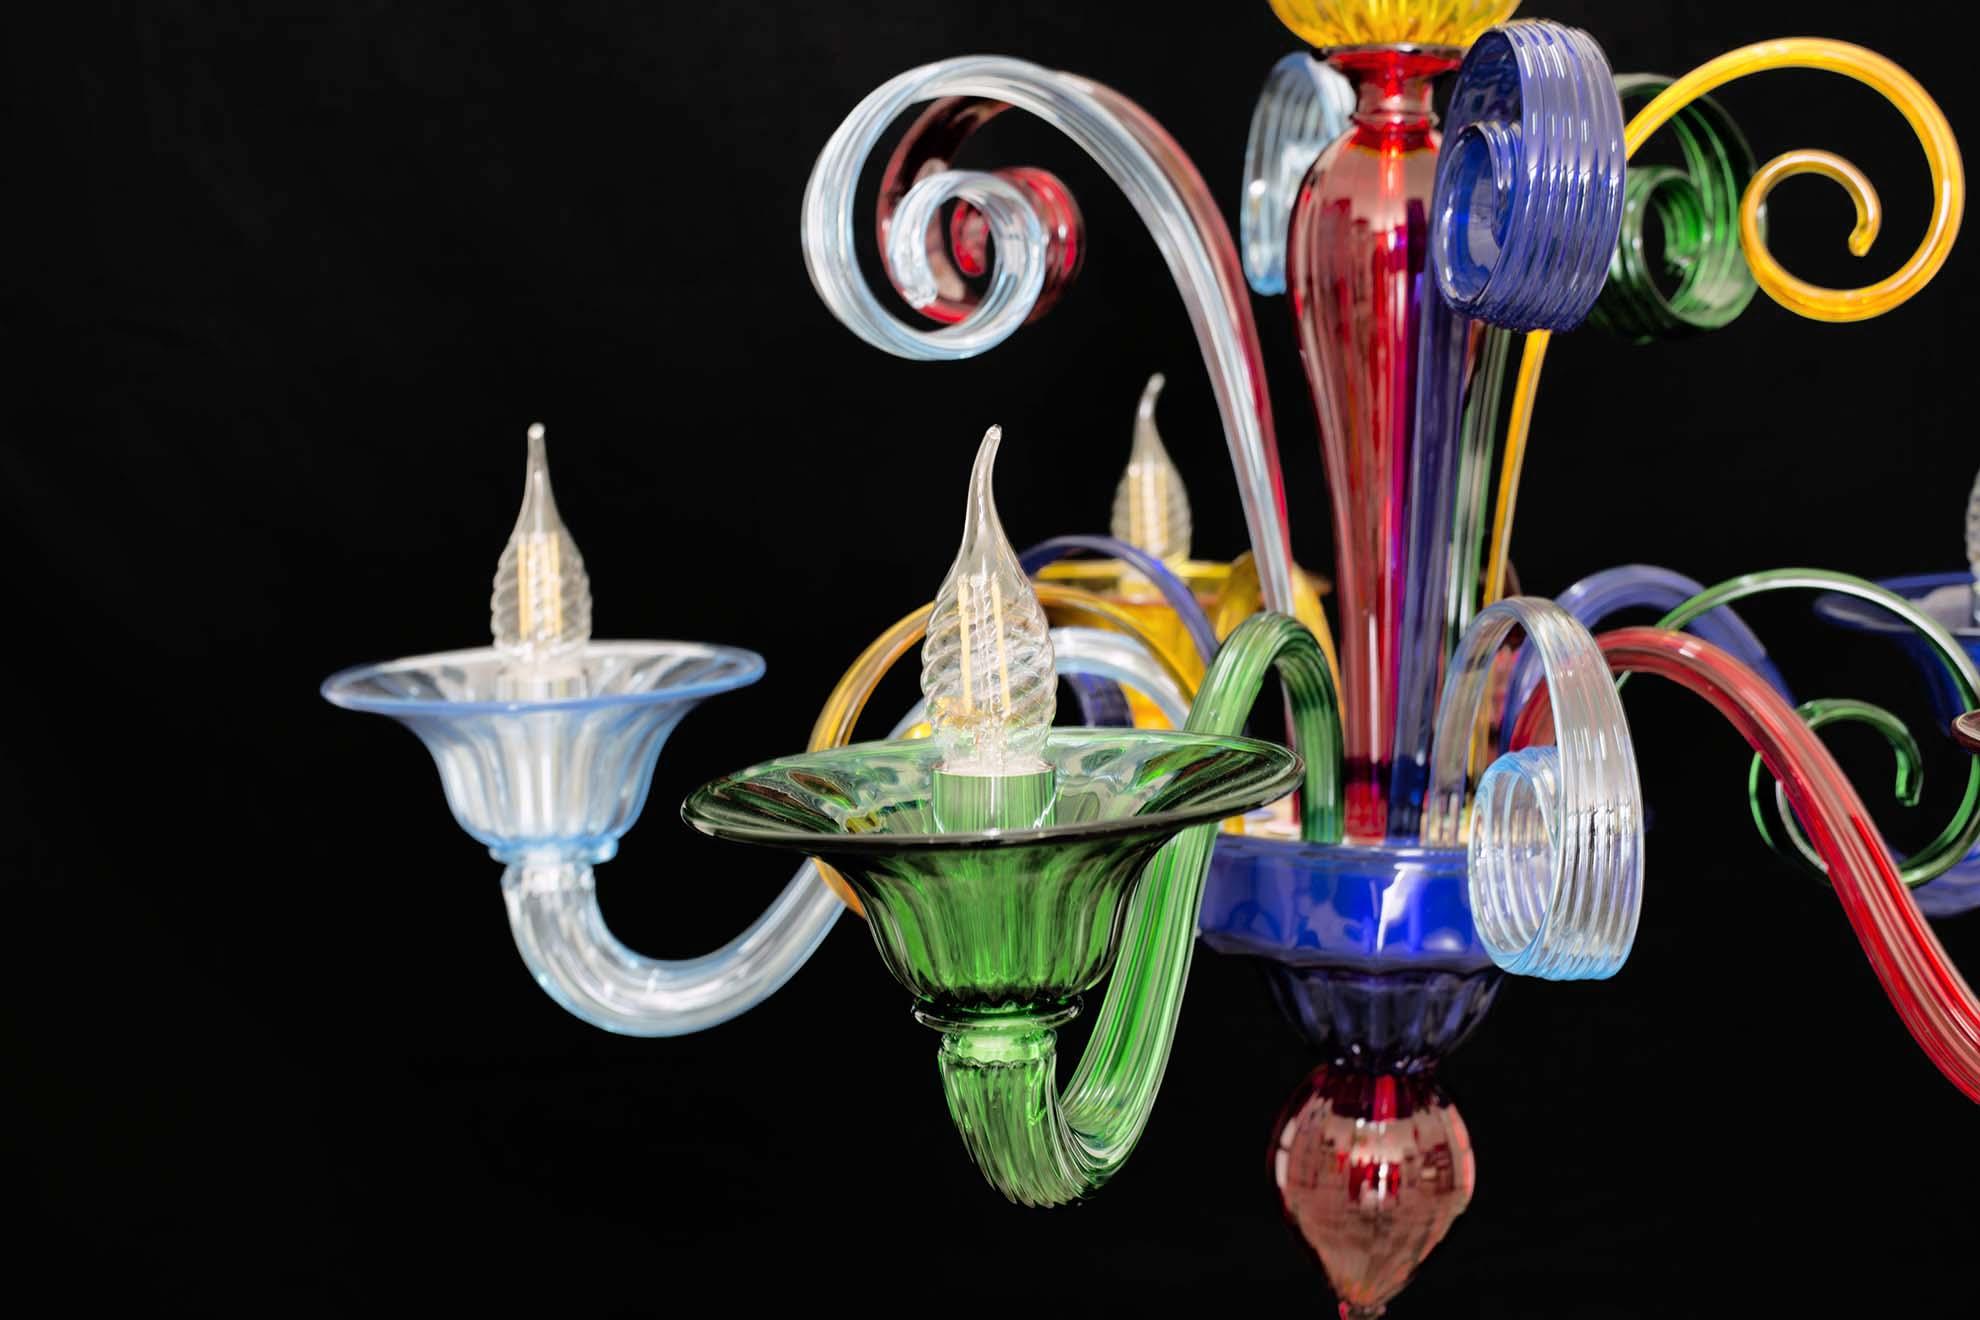 Lampadari murano moderni elegante ricambi per lampadari in vetro